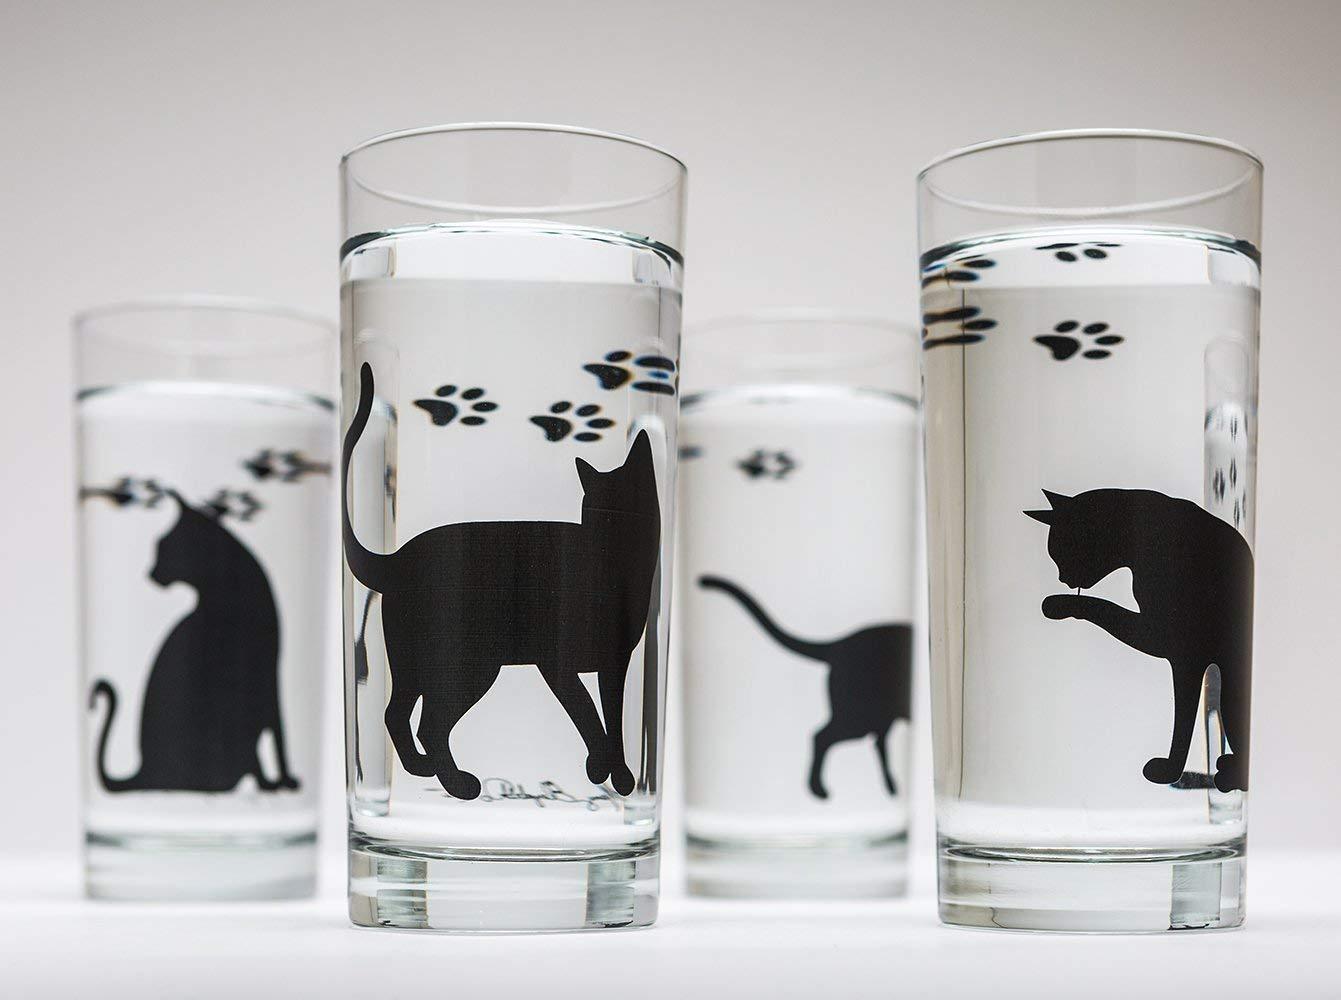 Cat Lovers Cat Glassware Gift Set Cat Glasses Black Cats Set of Four 16oz Glasses Birthday